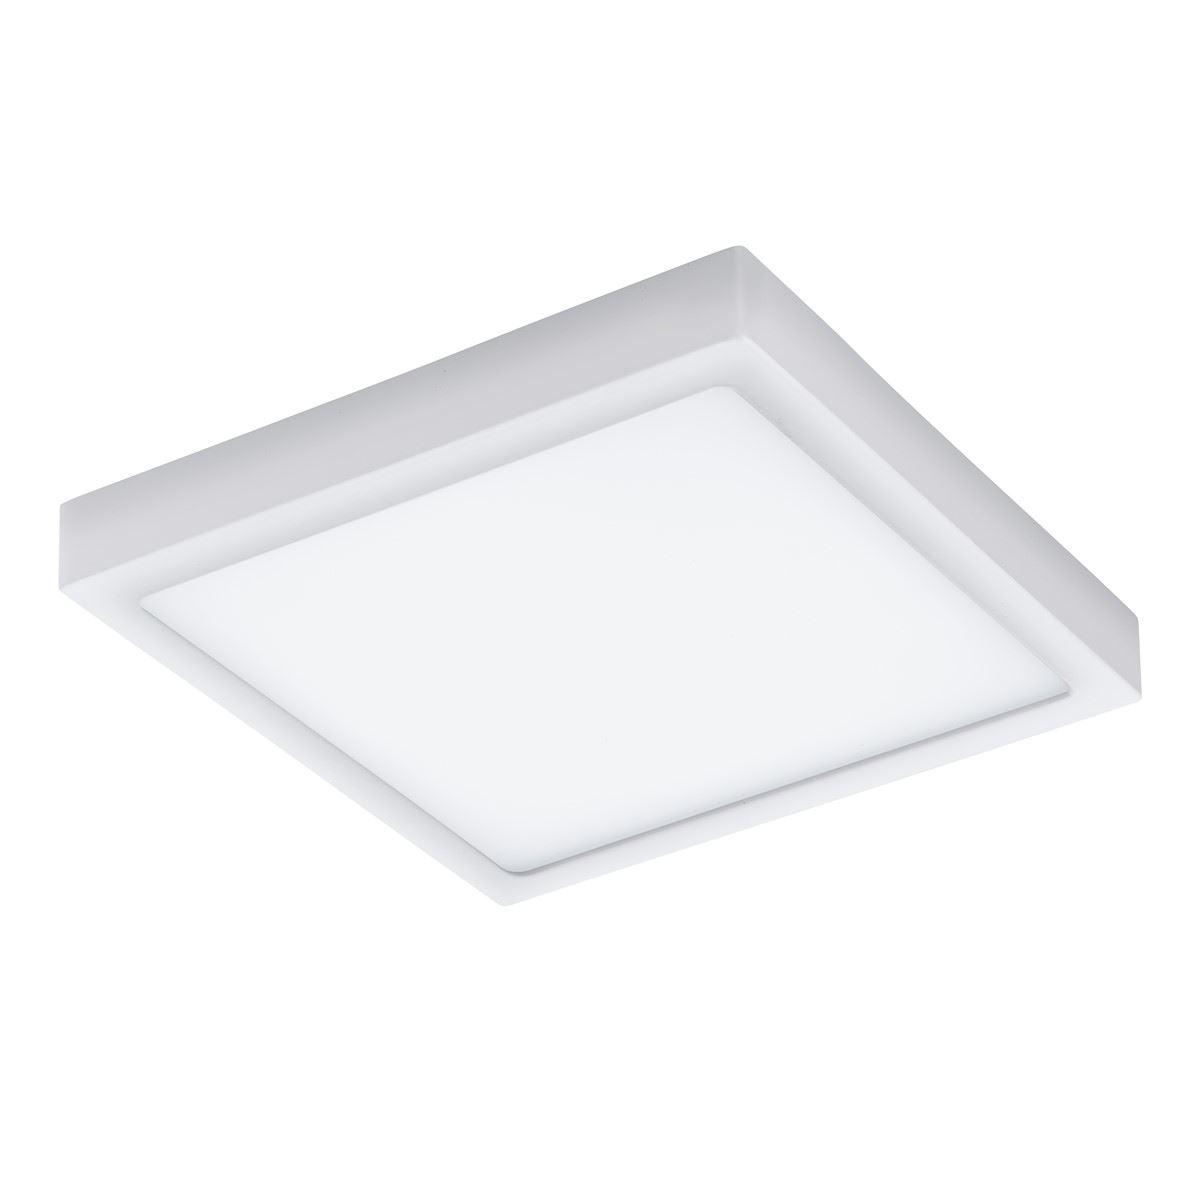 EGLO Angular Ceiling Light Argolis White Led 22W Ip44 Cast Aluminum Led White